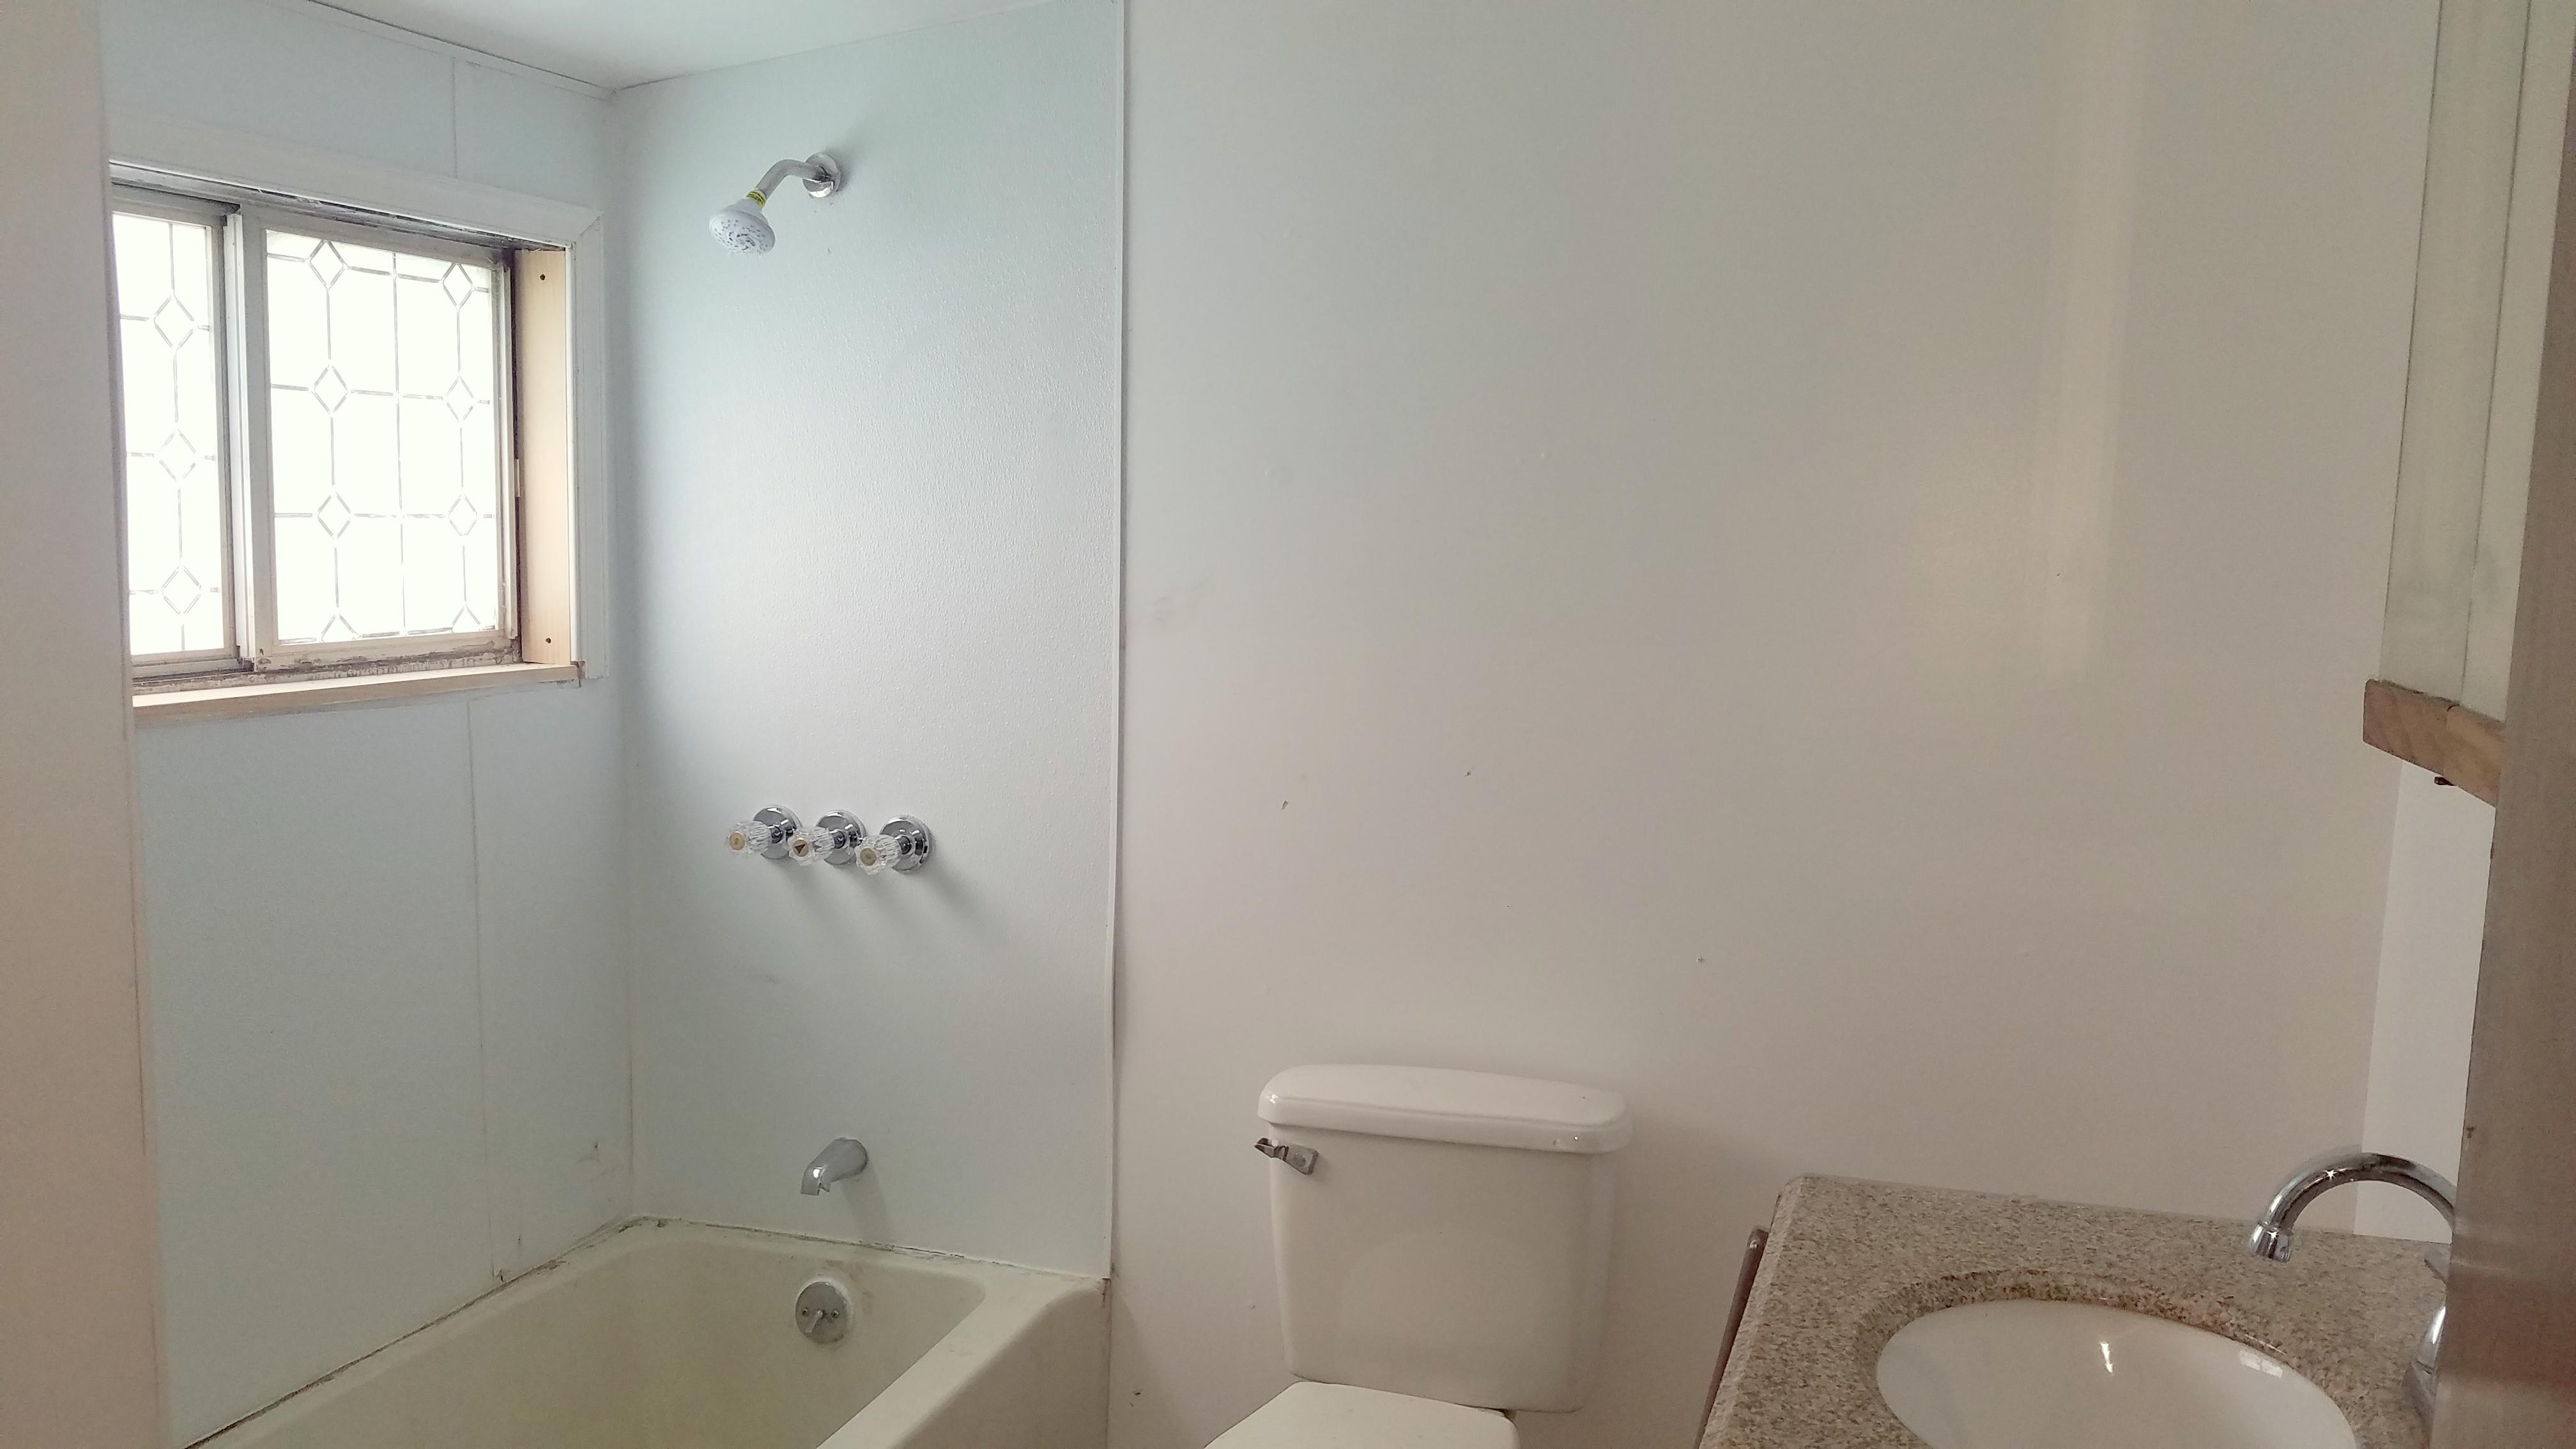 1109 Center Avenue Pottstown PA 19464 - bathroom